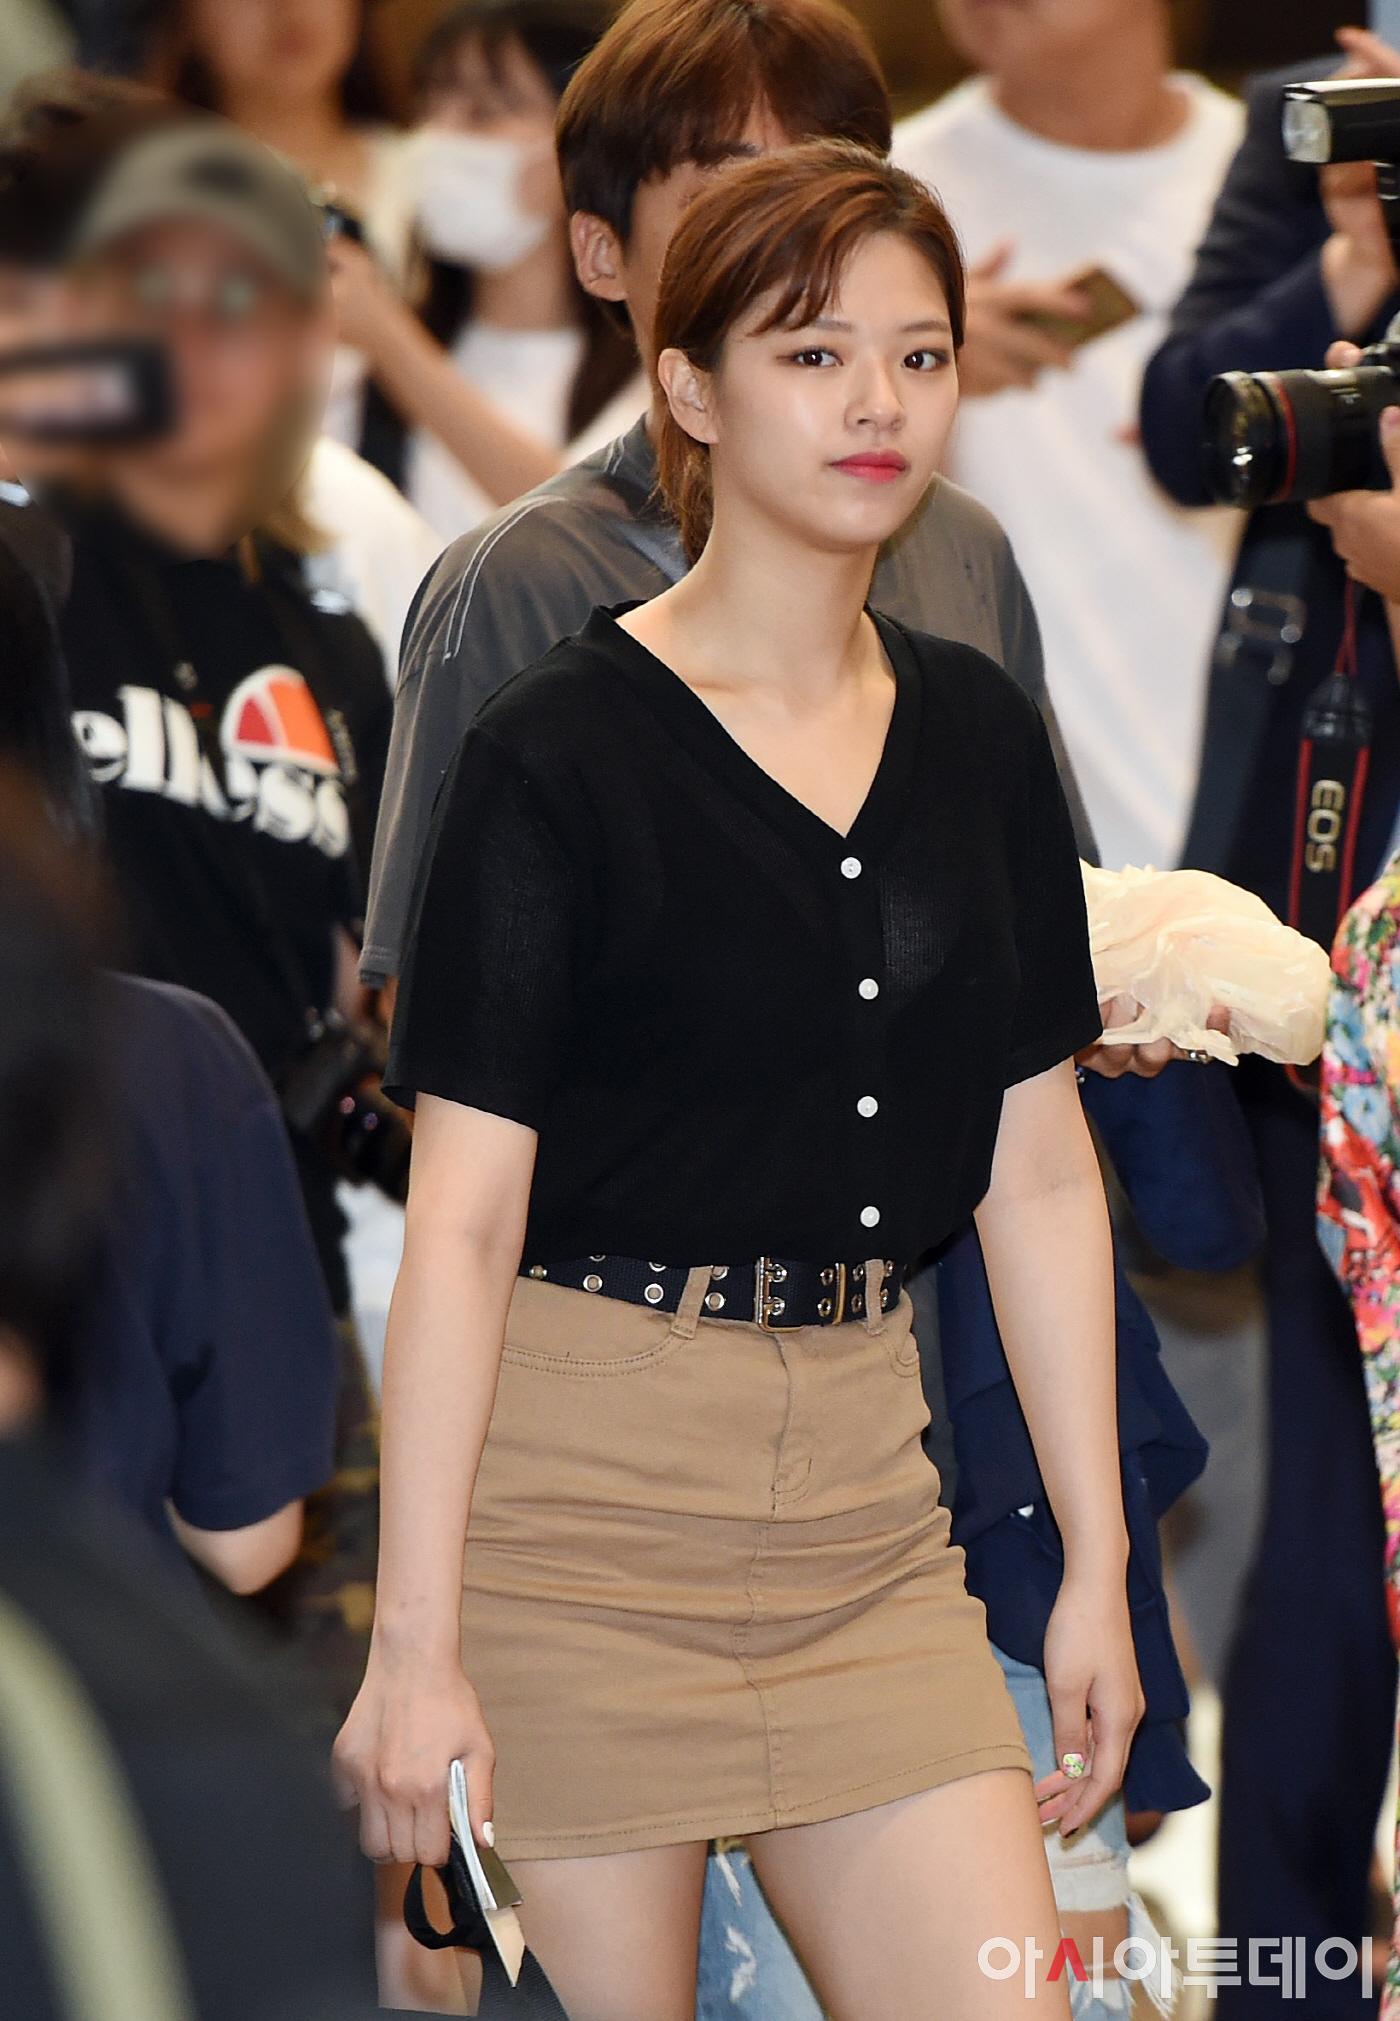 jeongyeon6